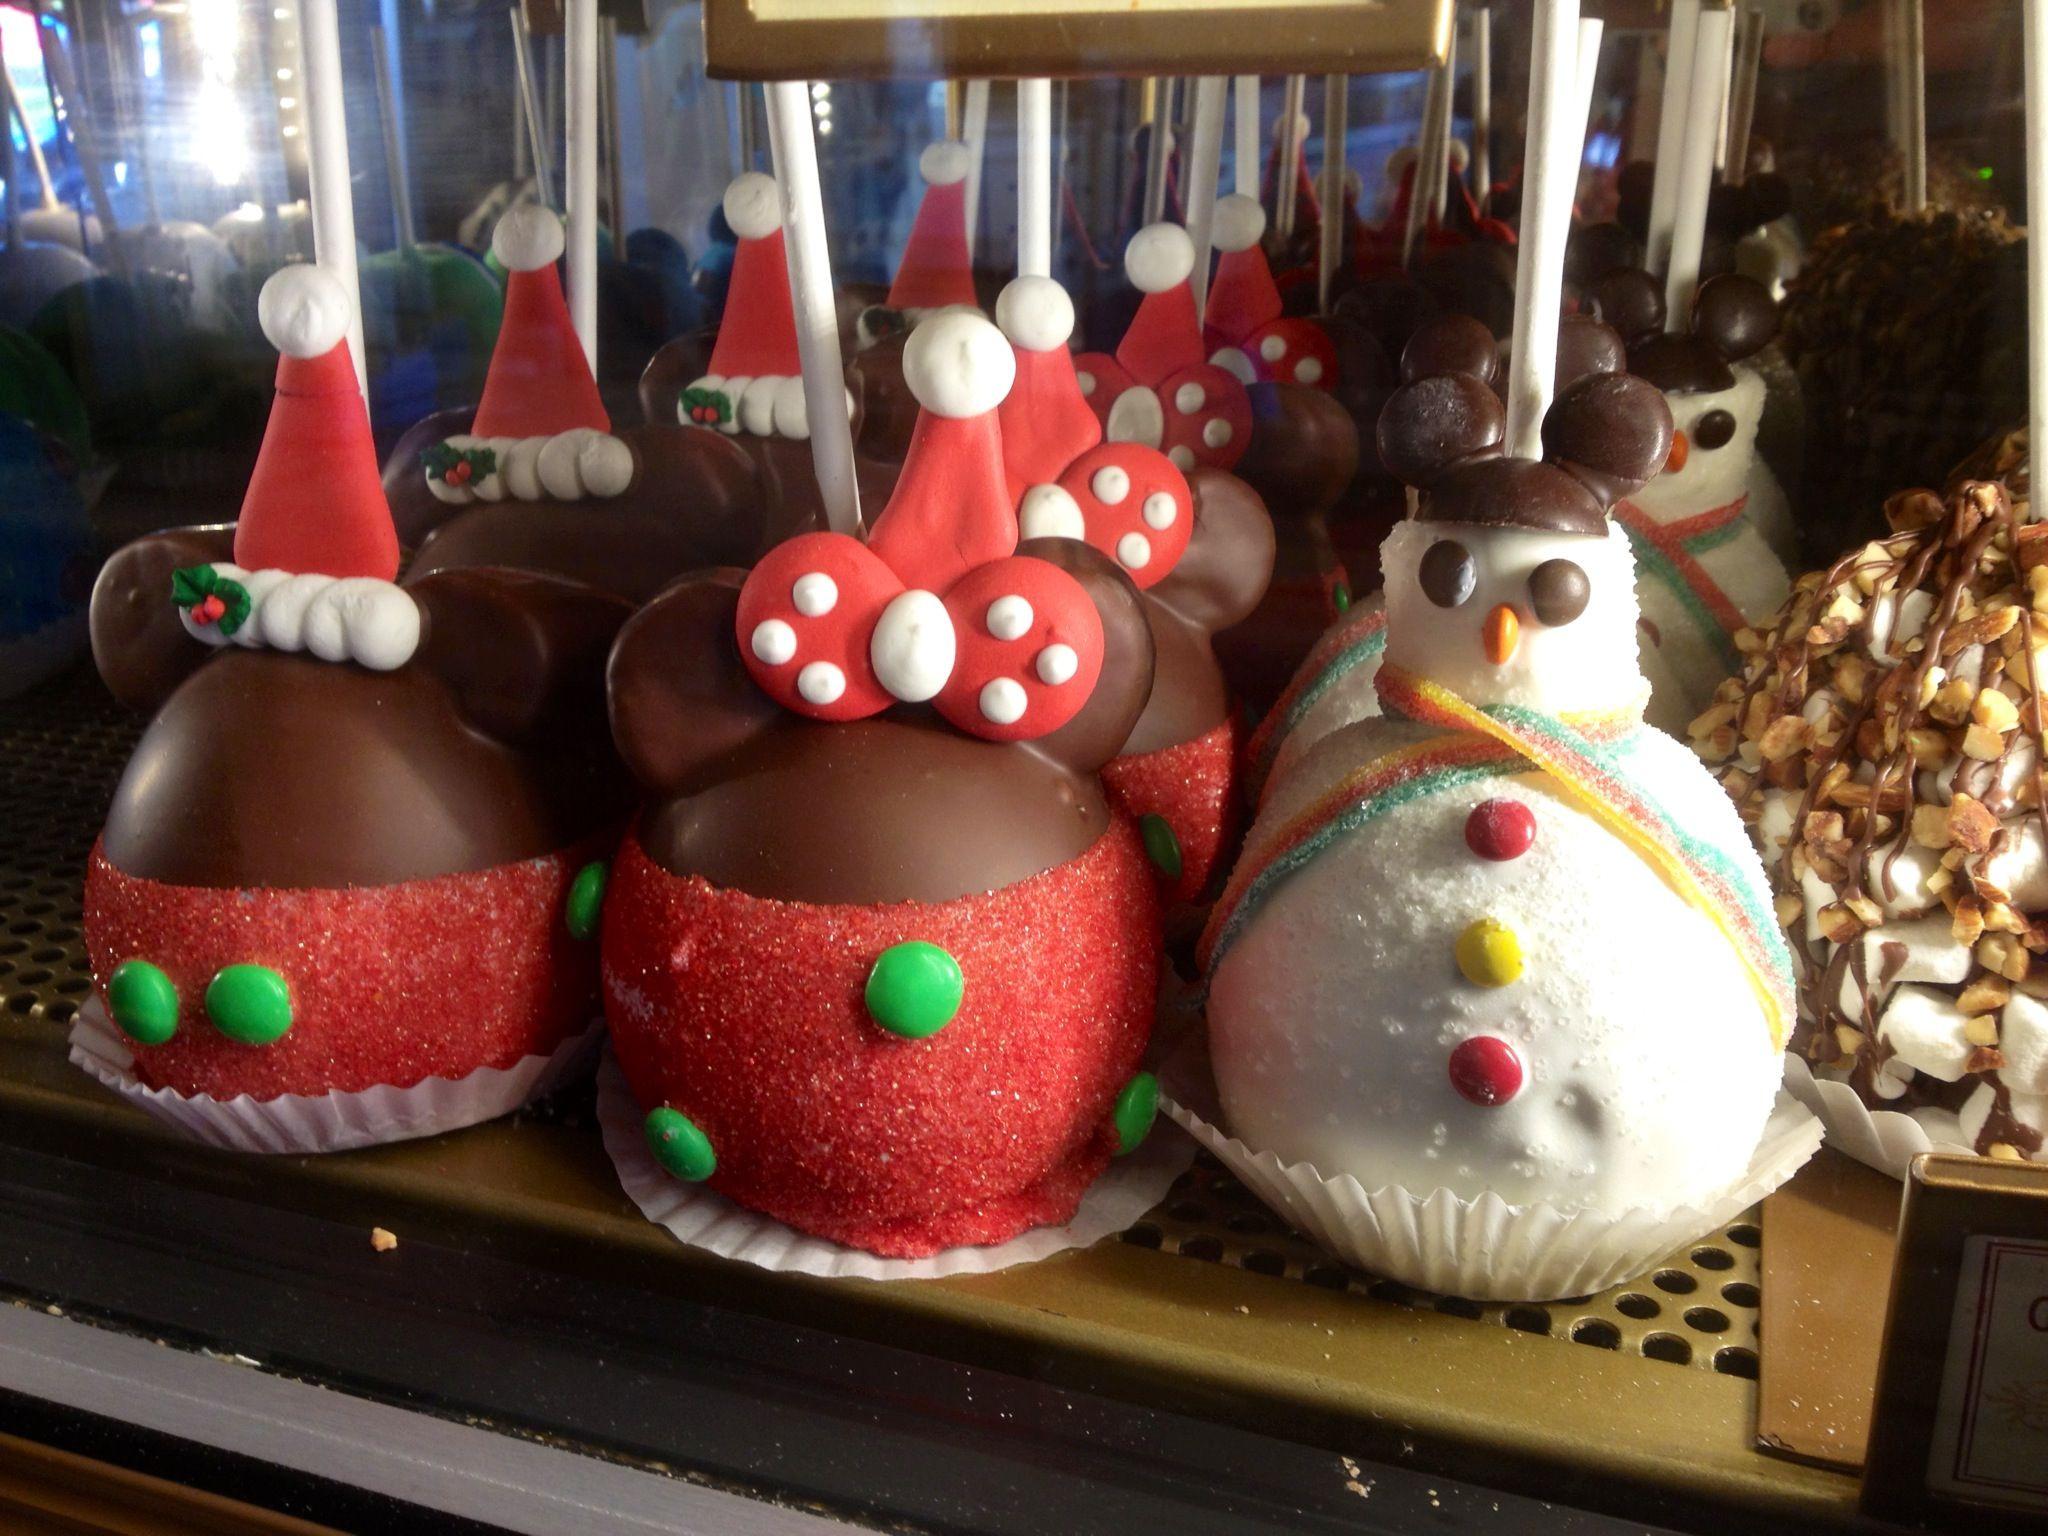 Christmas Caramel Apples  Holiday Caramel Apples at Disneyland